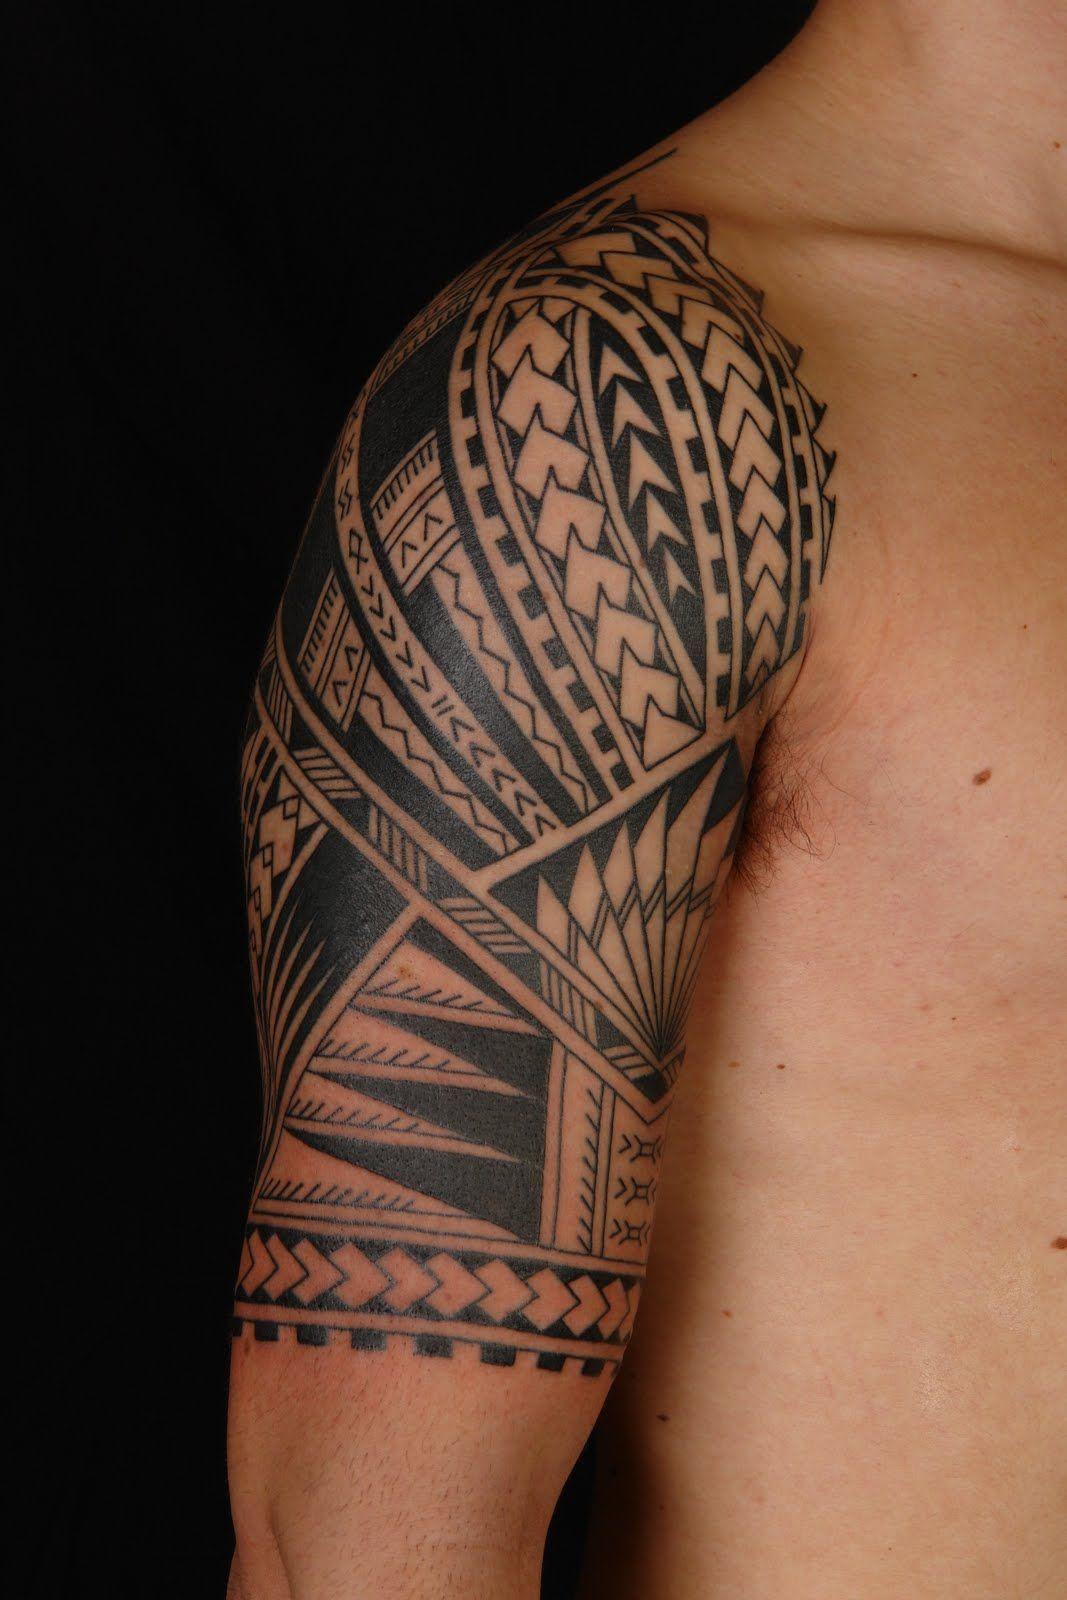 polynesian tattoos permanent tattoo tattoo and tattoos gallery. Black Bedroom Furniture Sets. Home Design Ideas